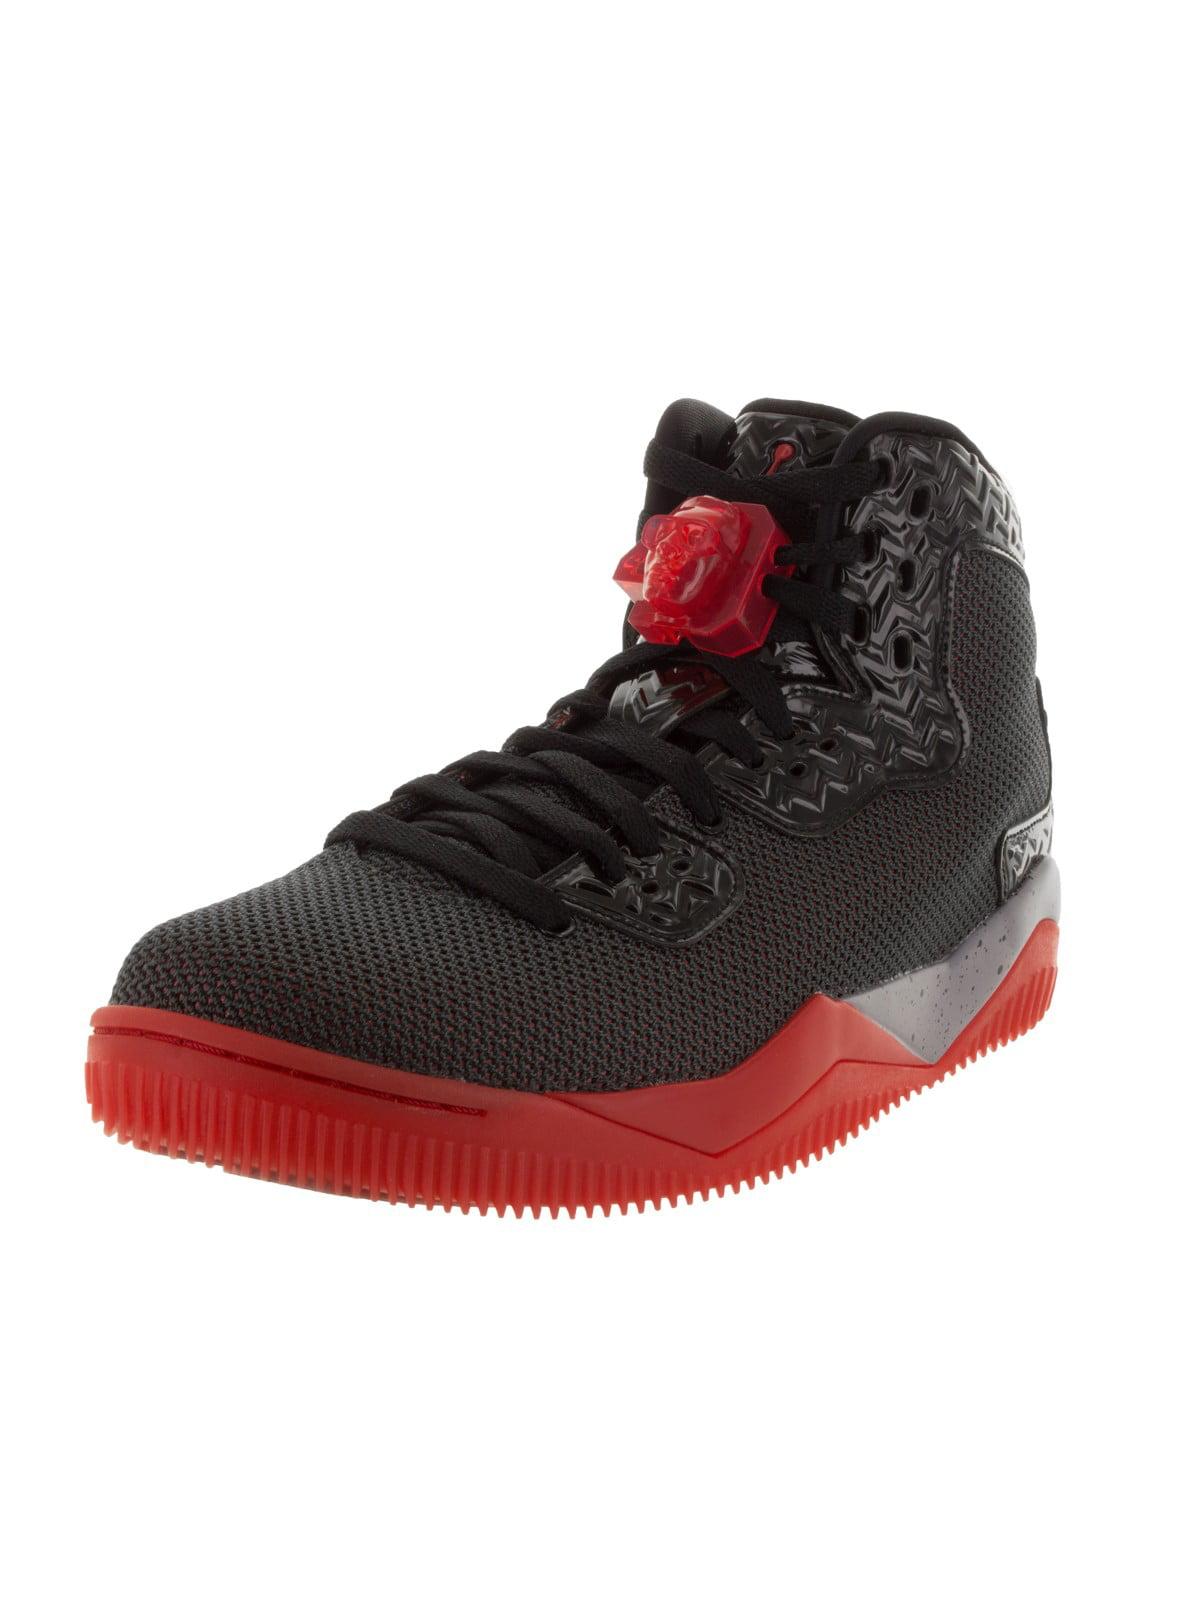 22a31ae85f53 where to buy nike jordan mens air jordan spike forty pe basketball shoe  9b22b f74c5